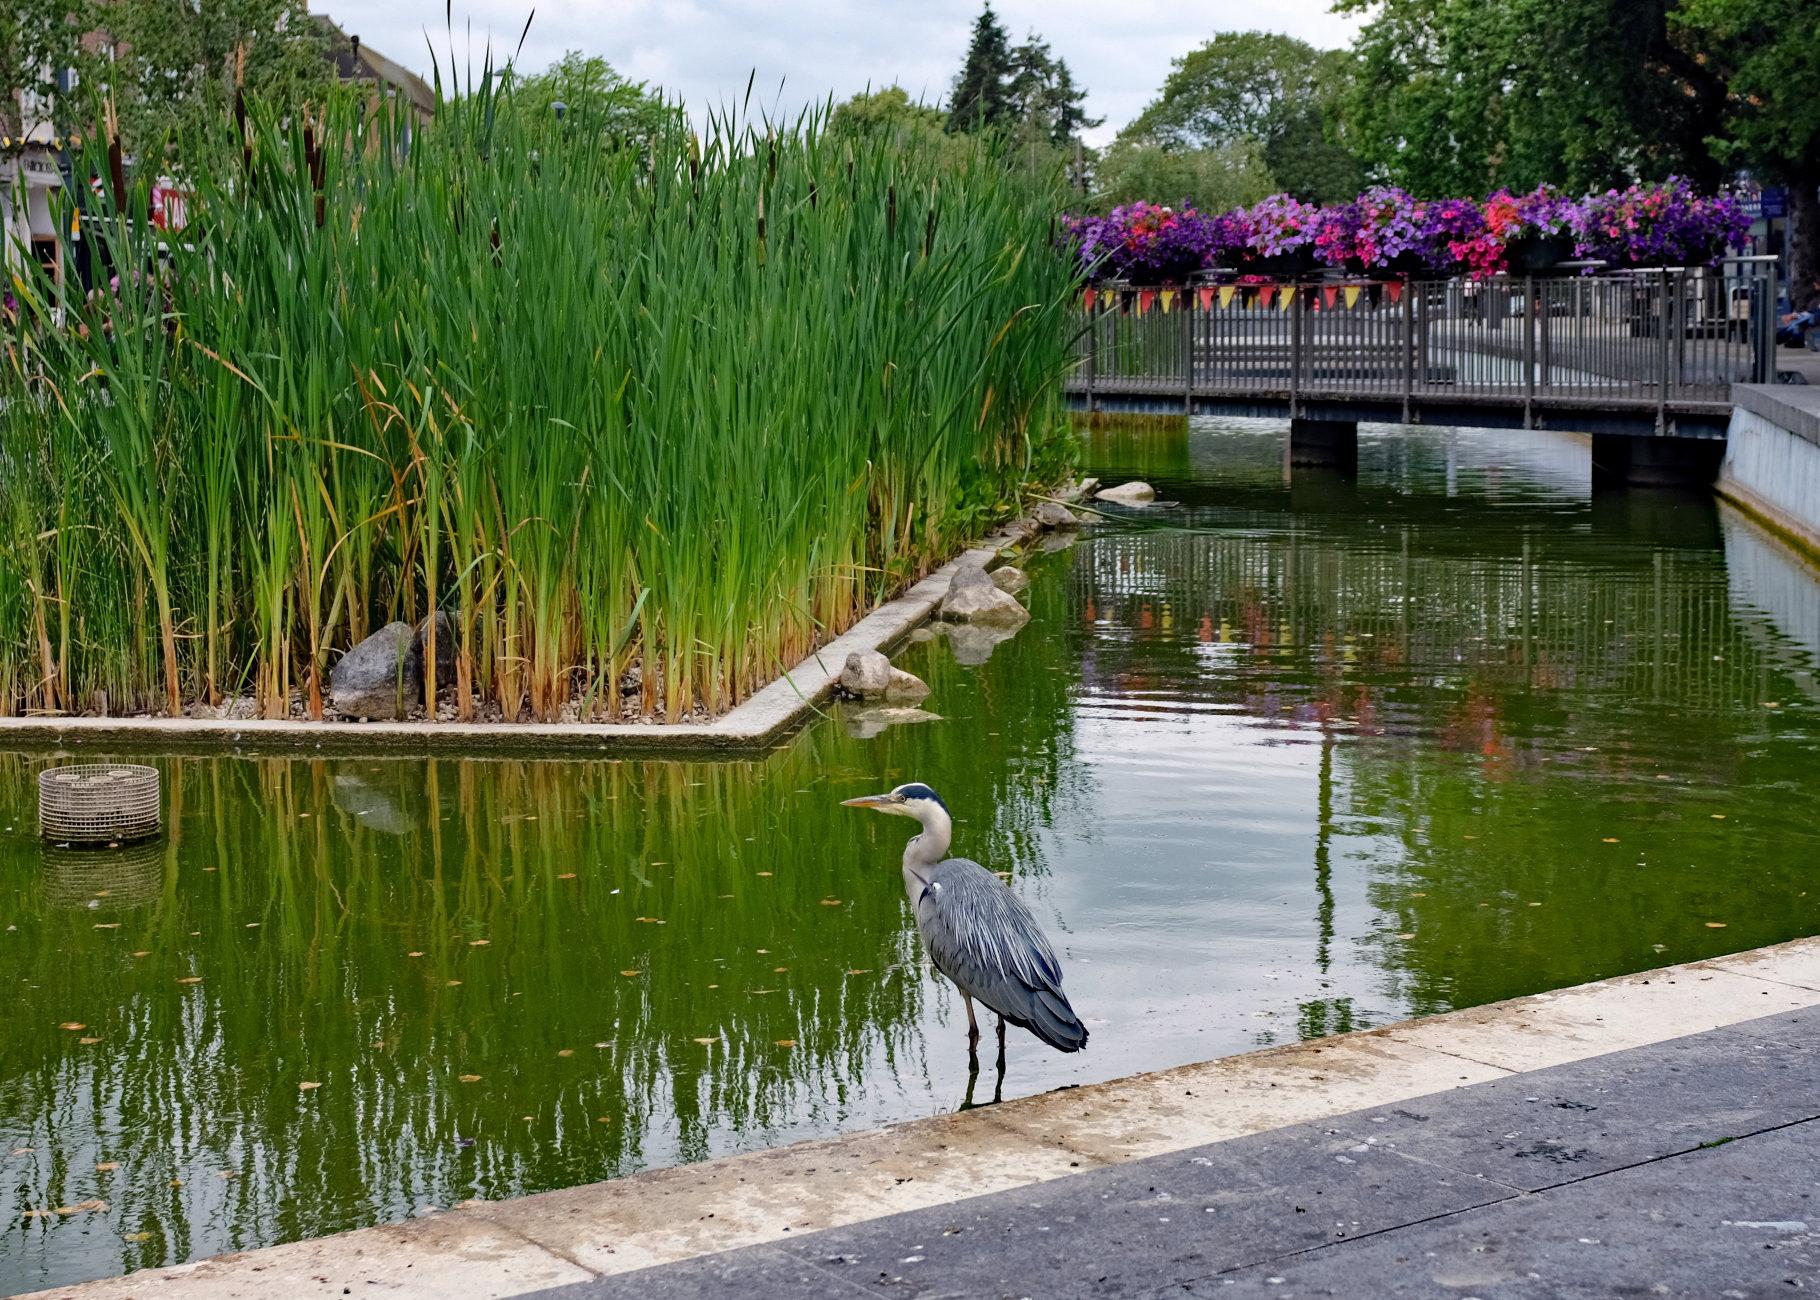 Heron - Town Centre Pond